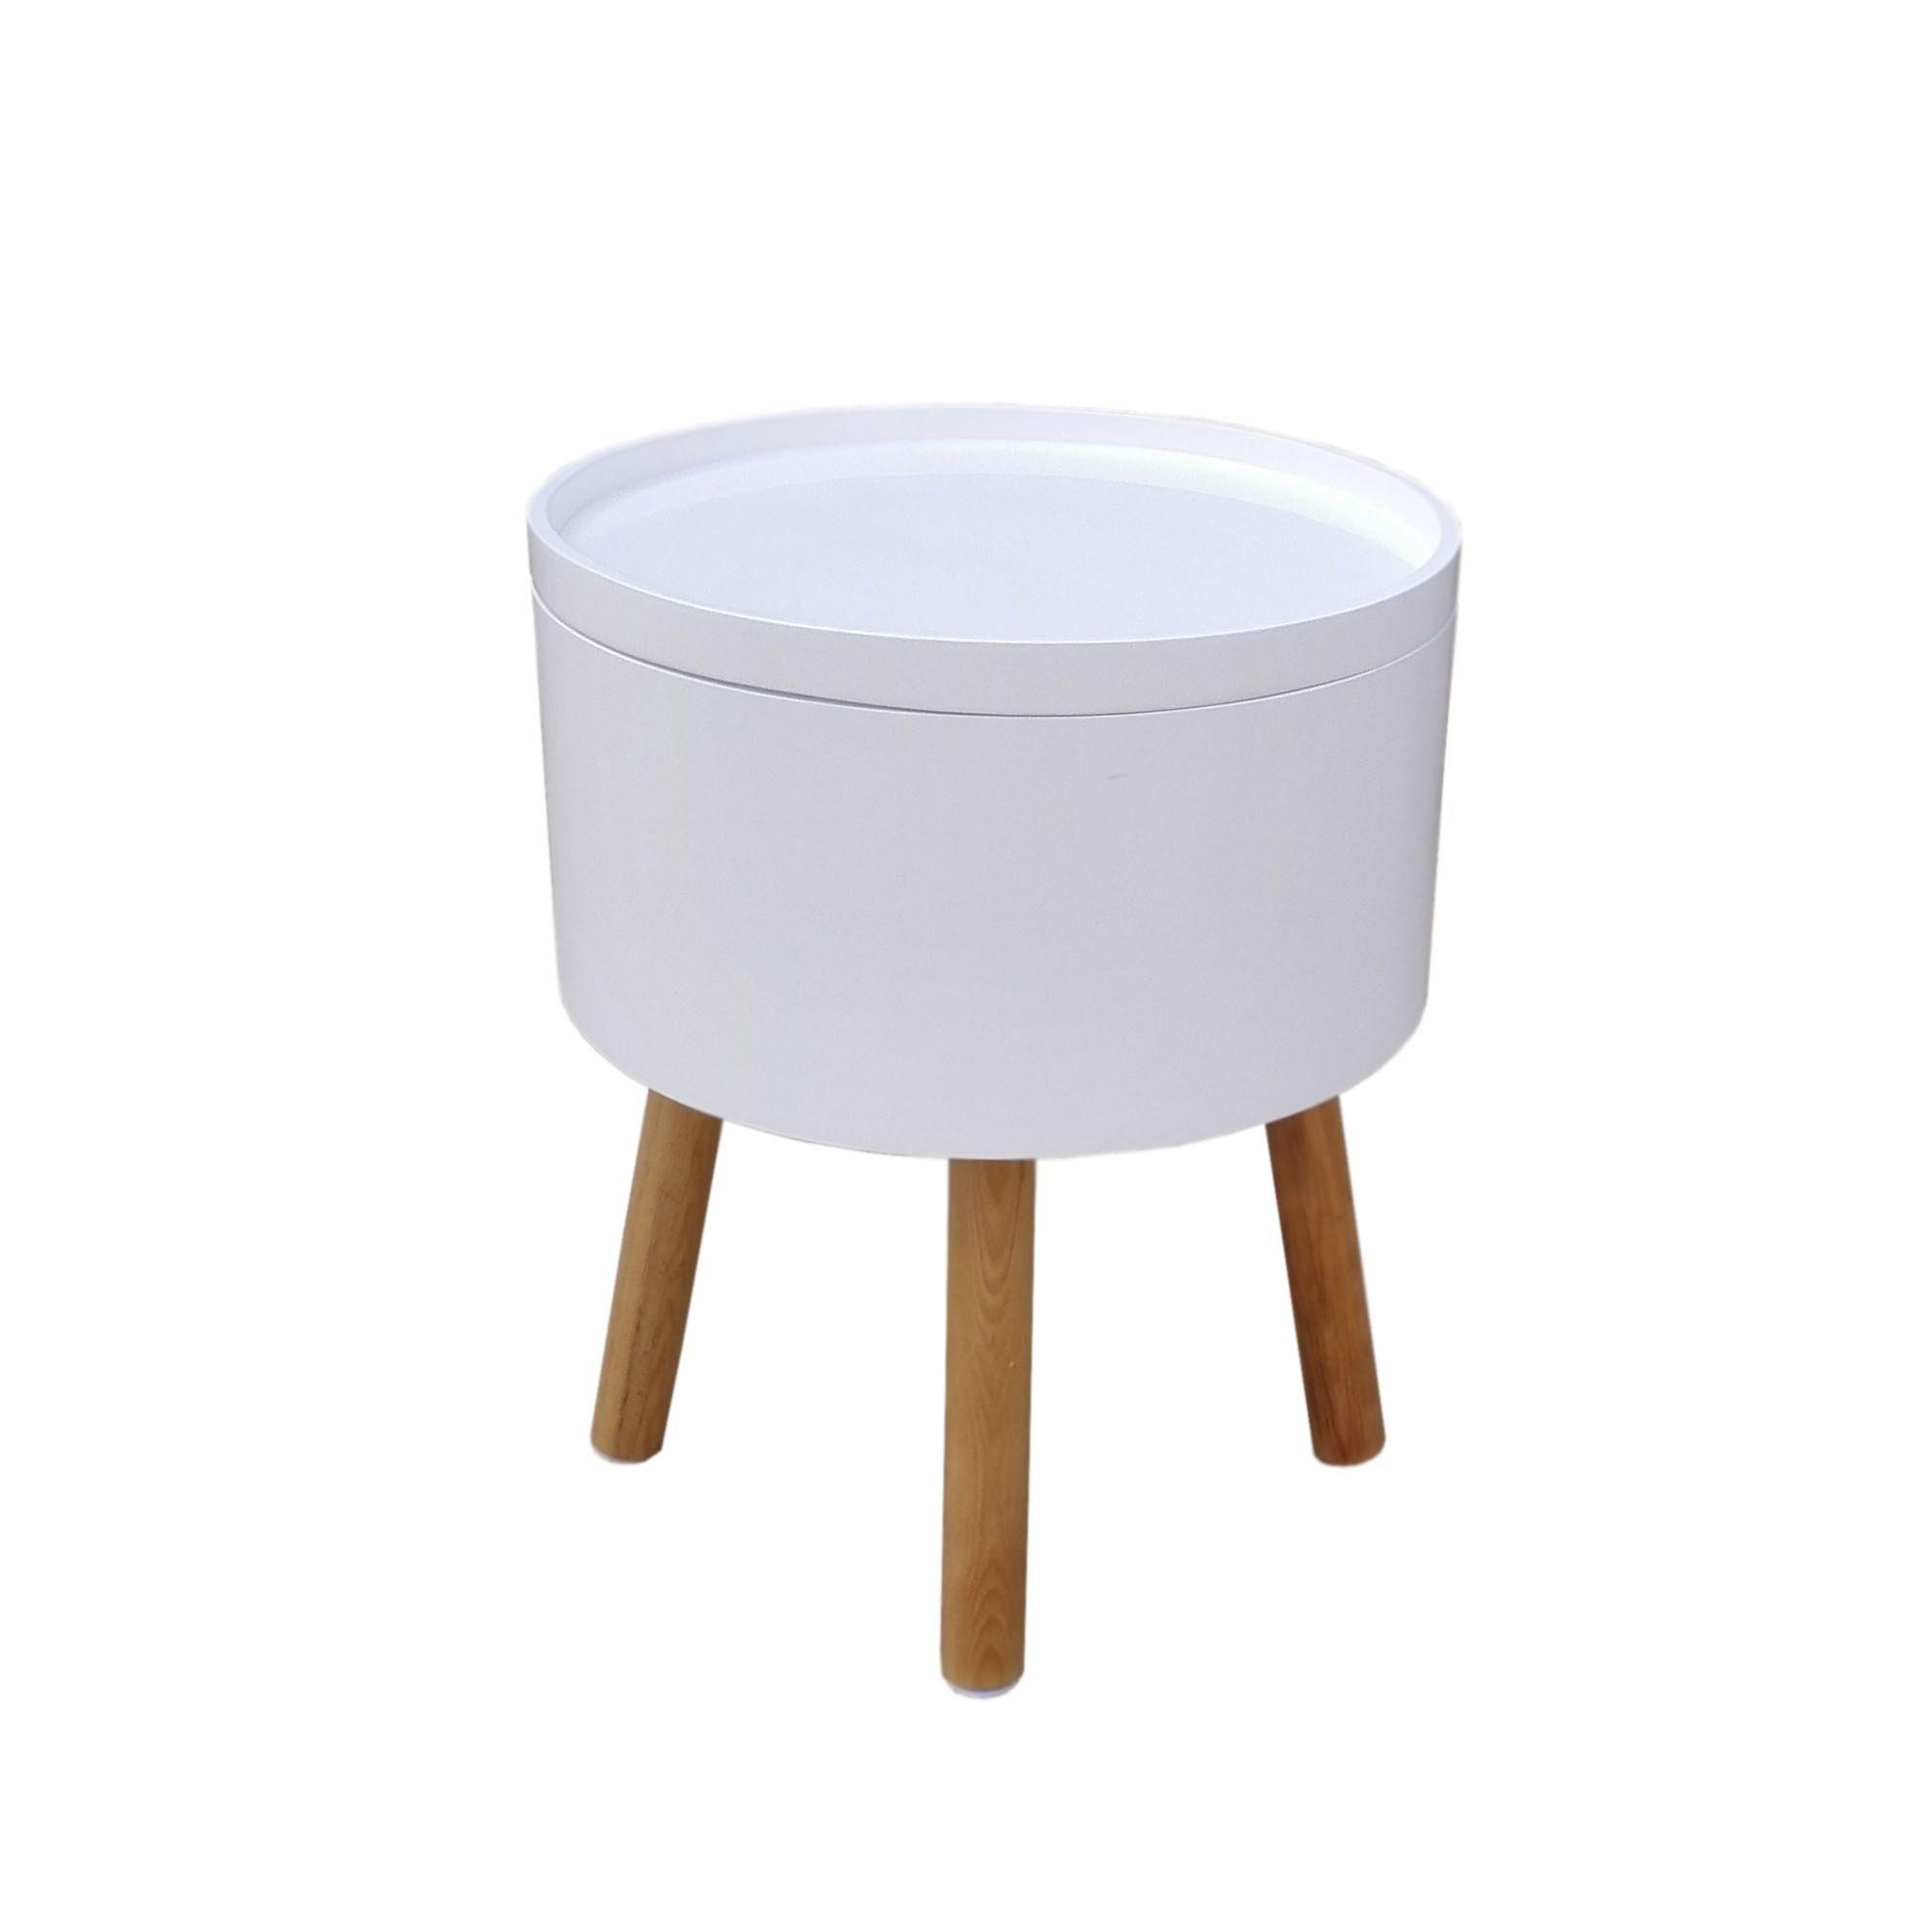 panier a linge alinea coupe glace en aluminium petit modle with panier a linge alinea panier a. Black Bedroom Furniture Sets. Home Design Ideas